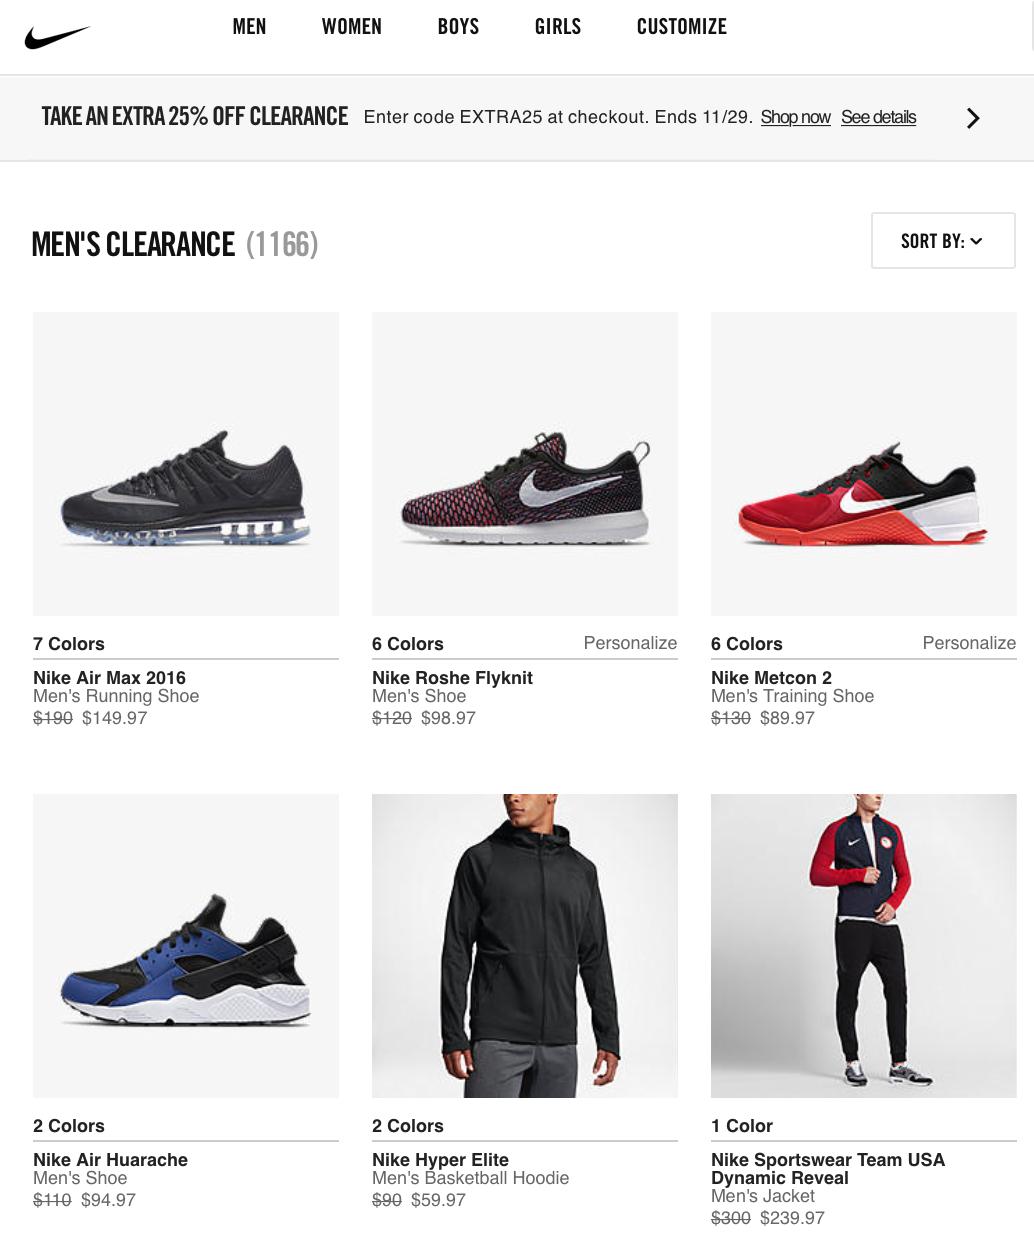 Medicina Forense Diariamente dentro de poco  Nike Black Friday 2021 Sale - What to Expect - Blacker Friday